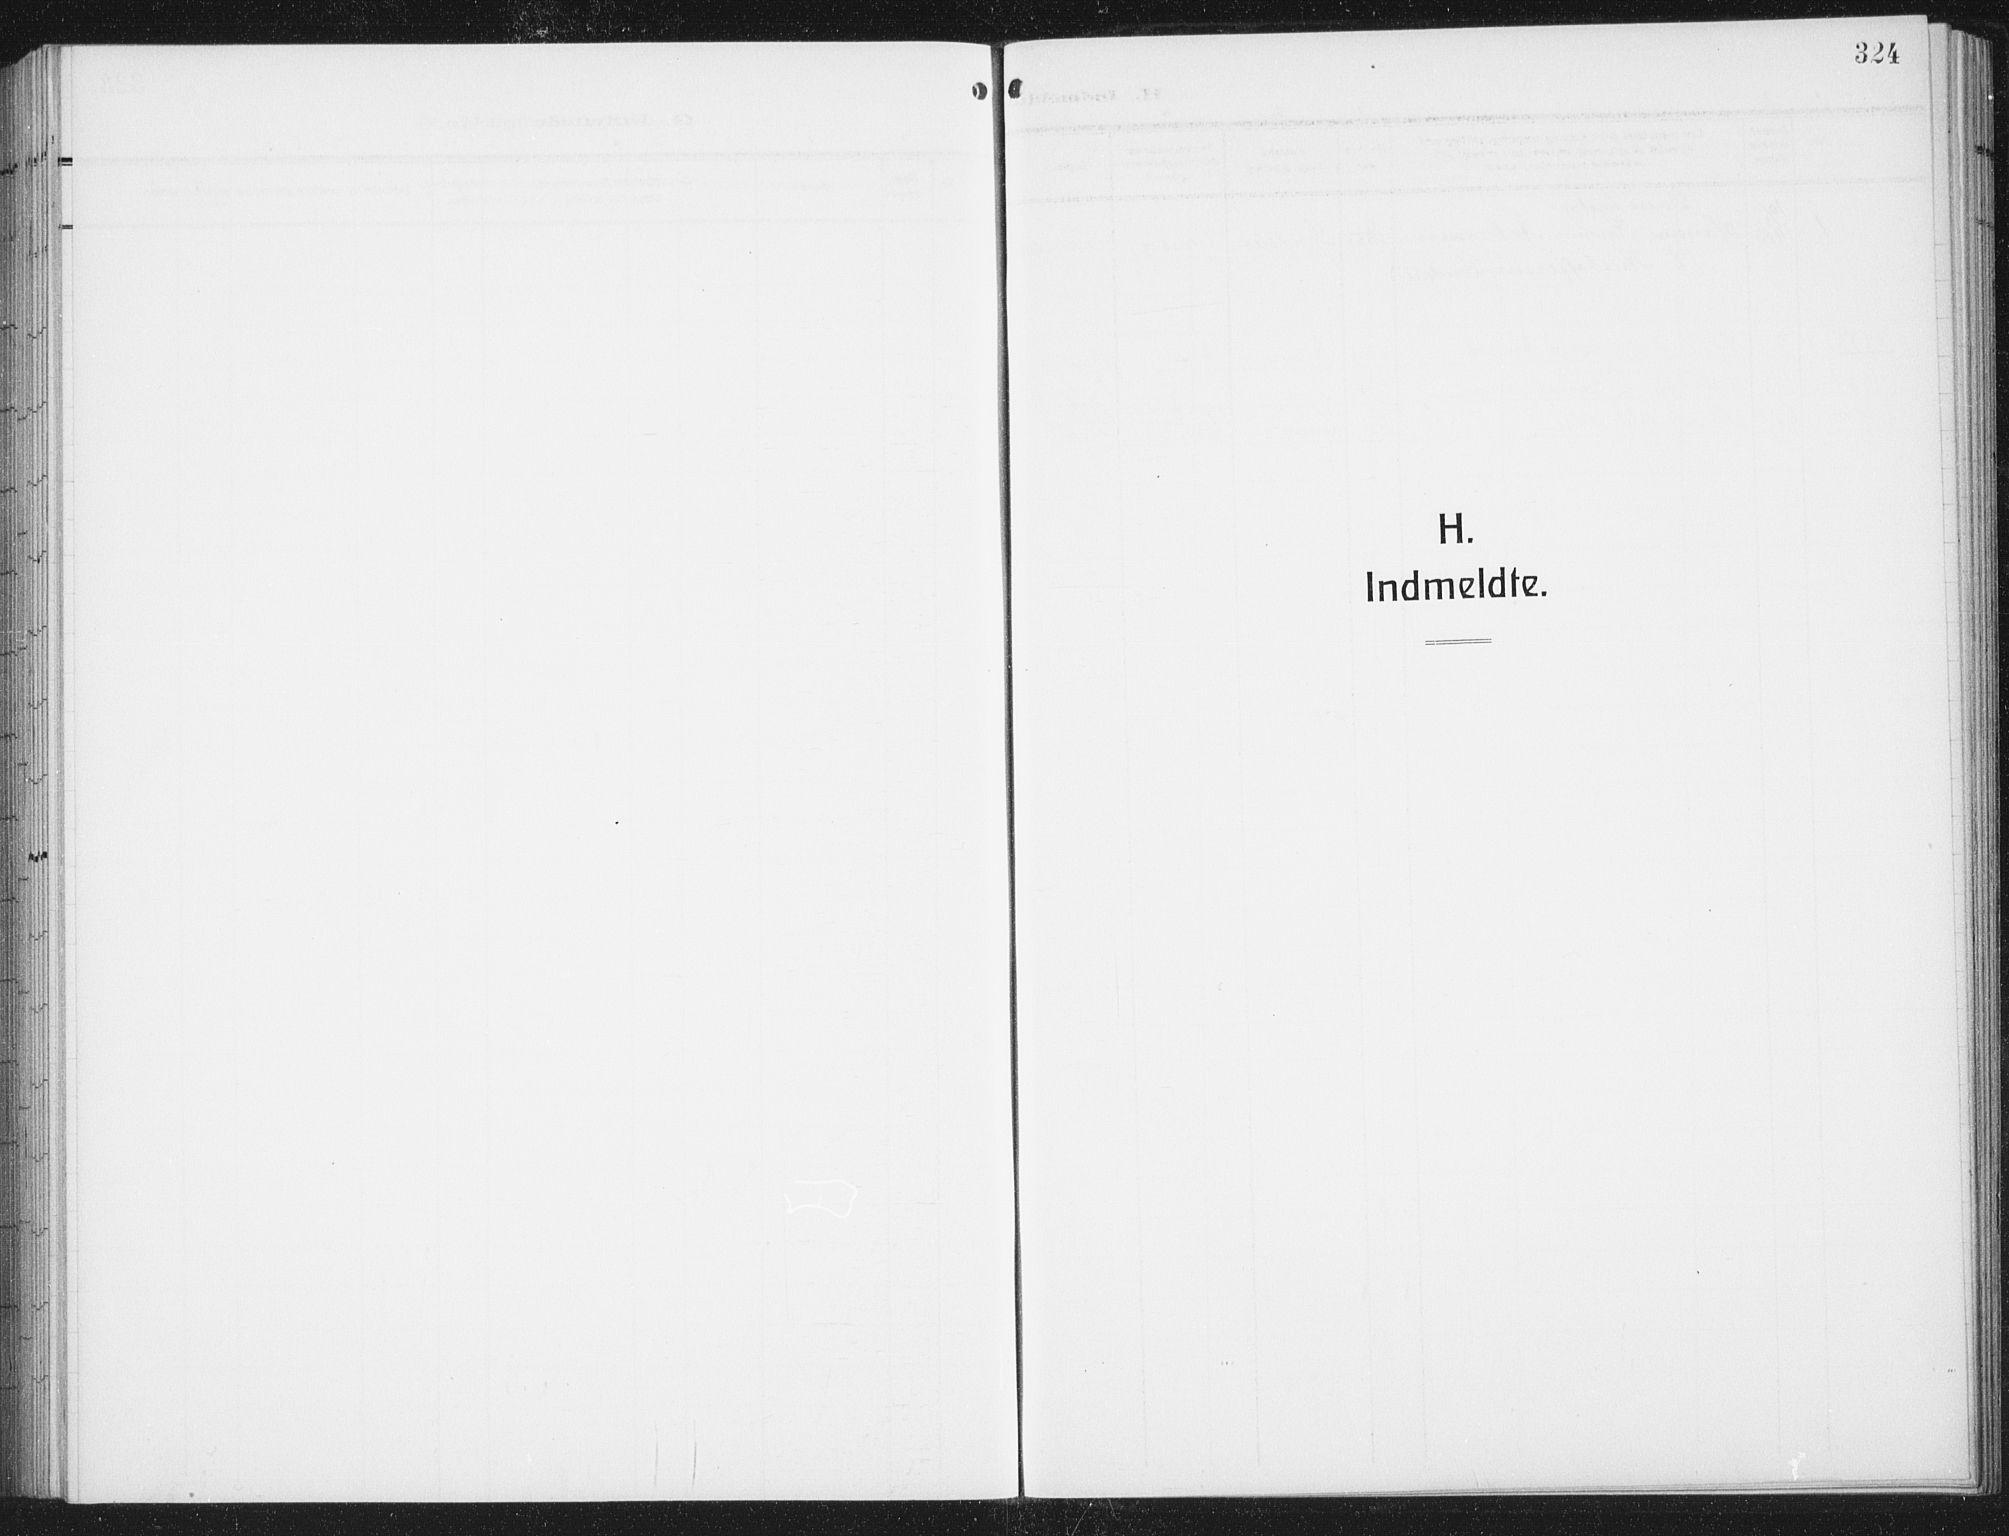 SAT, Ministerialprotokoller, klokkerbøker og fødselsregistre - Nordland, 876/L1106: Klokkerbok nr. 876C05, 1915-1942, s. 324